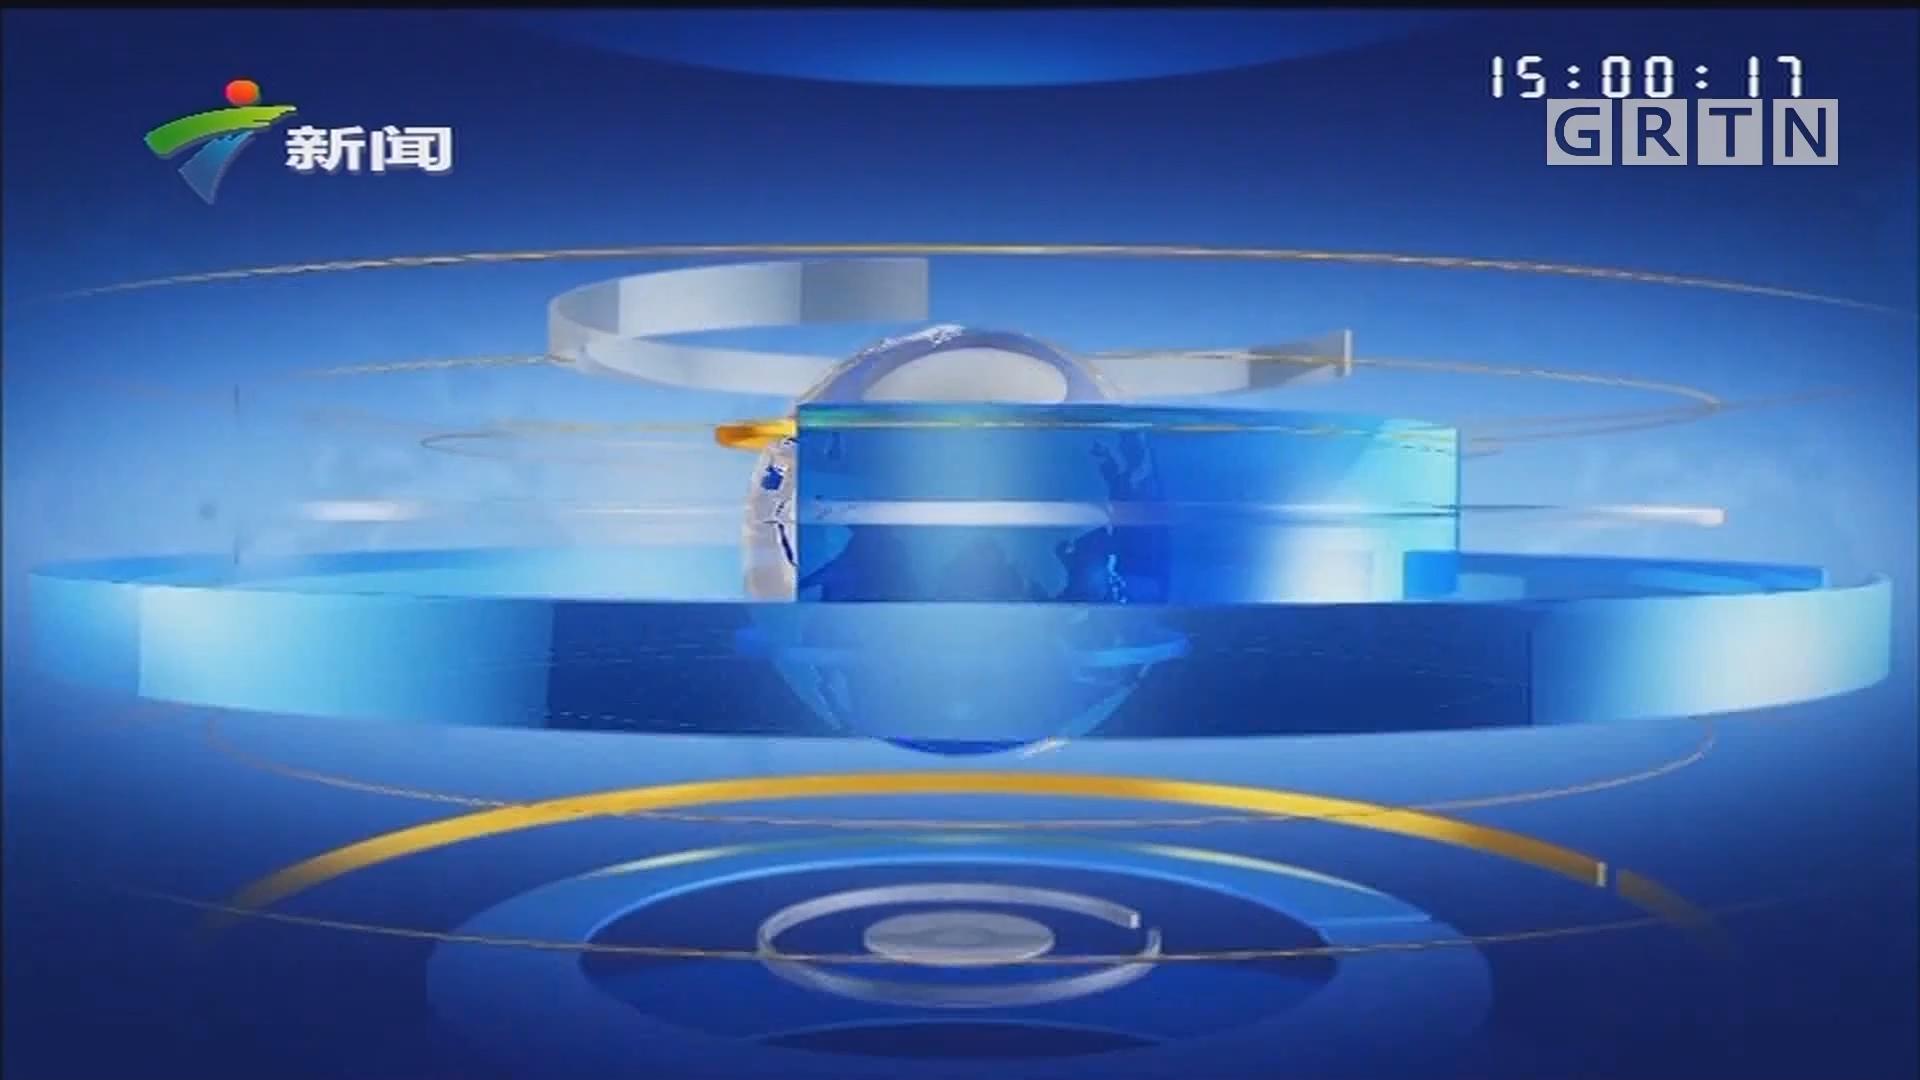 [HD][2019-10-22]正點播報:世界互聯網大會:約30家粵企參展 展示前沿科技